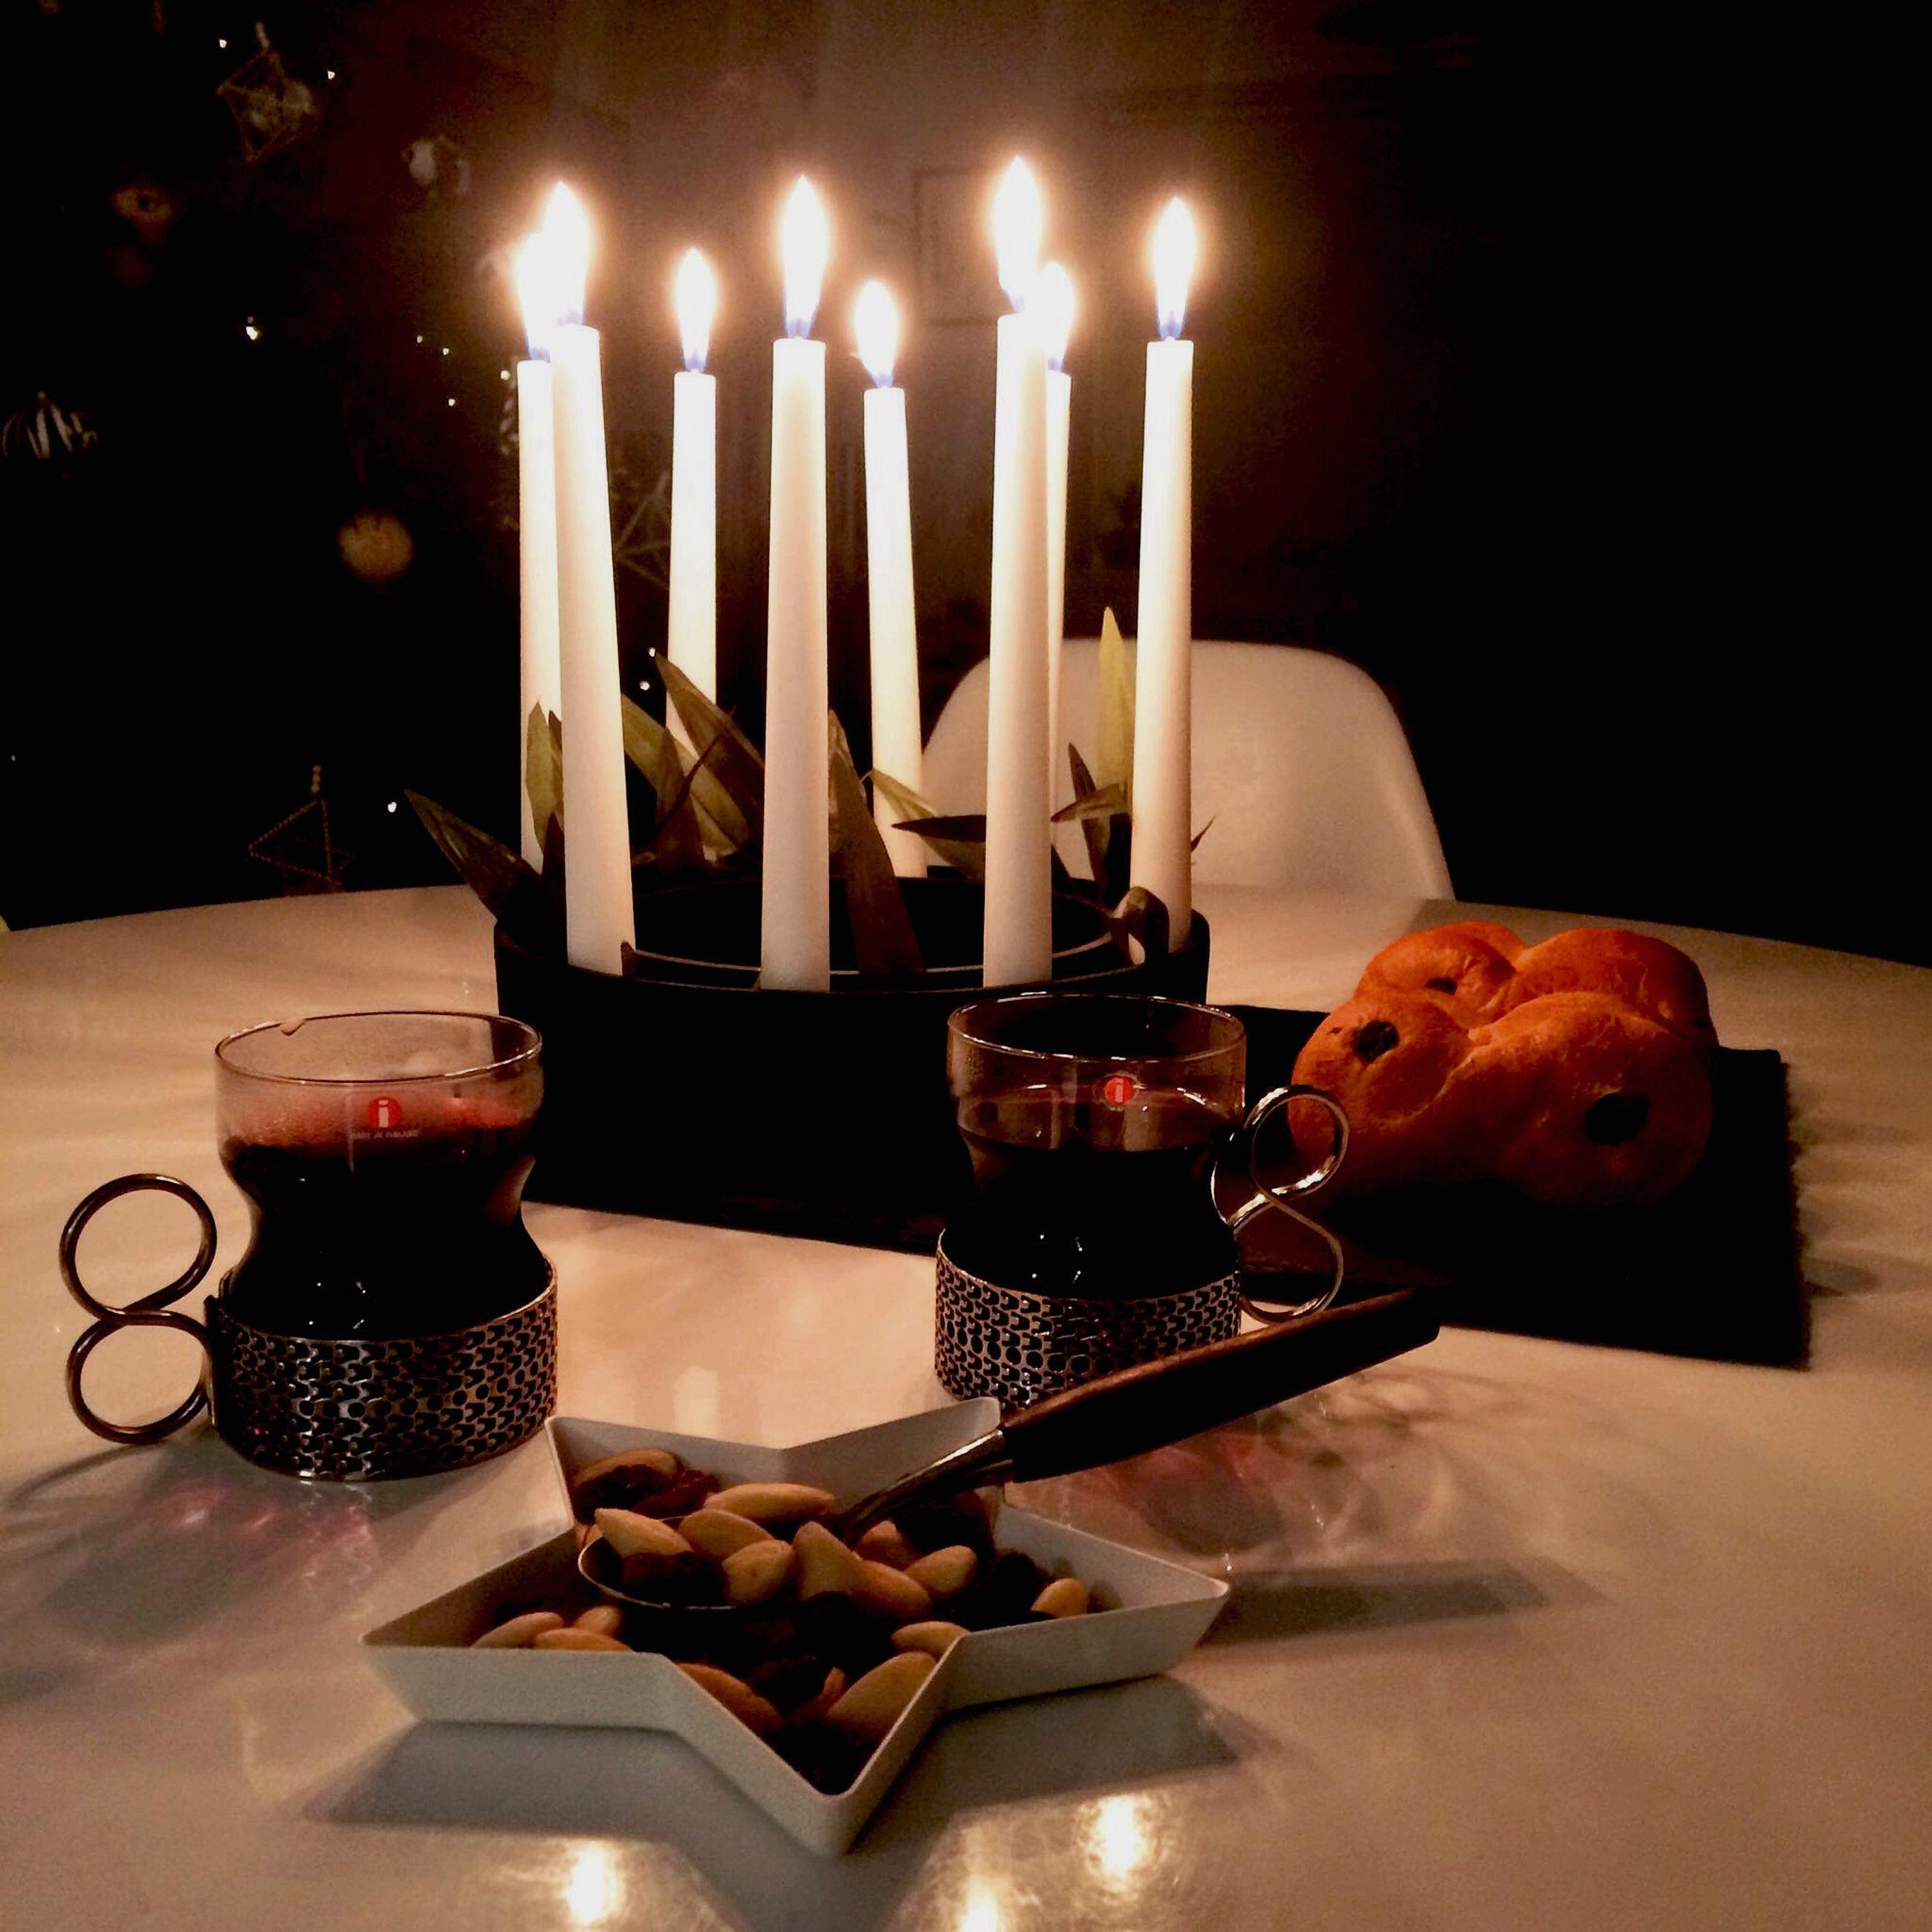 candle, flame, burning, celebration, human hand, food and drink, indoors, table, birthday cake, close-up, illuminated, birthday candles, black background, freshness